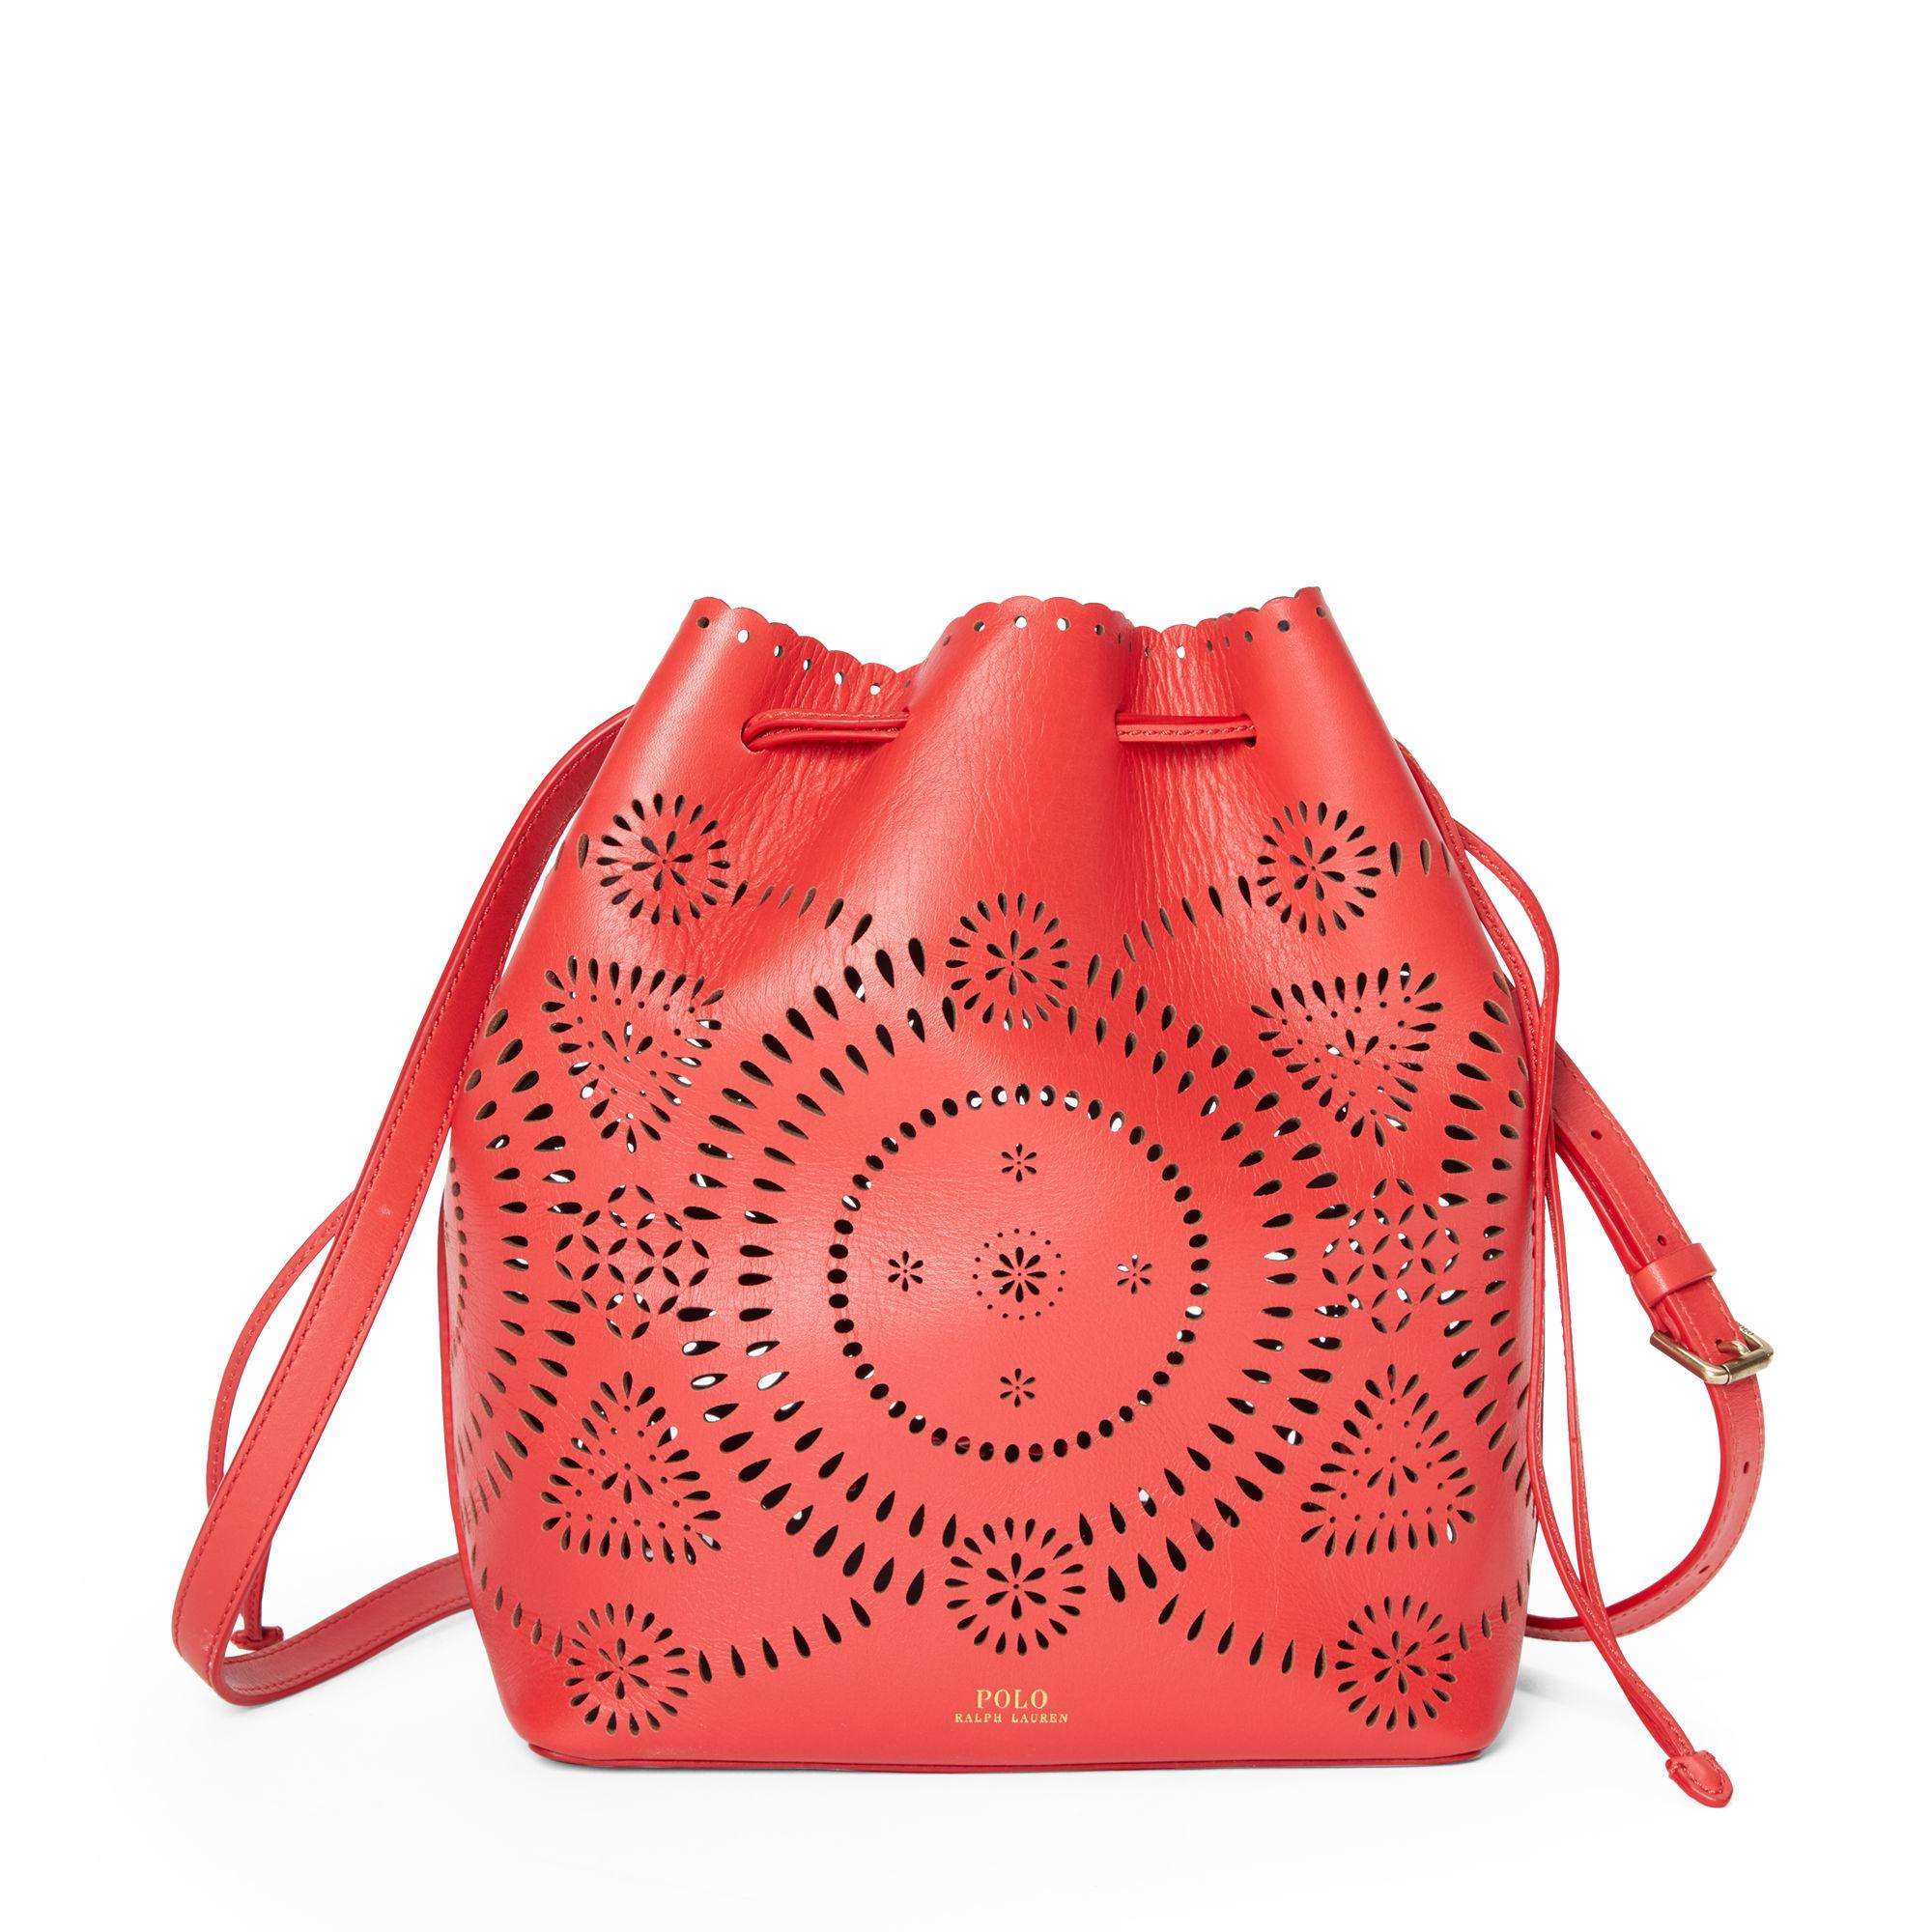 61ba9fcc61 Polo Ralph Lauren Laser-cut Leather Bucket Bag in Red - Lyst